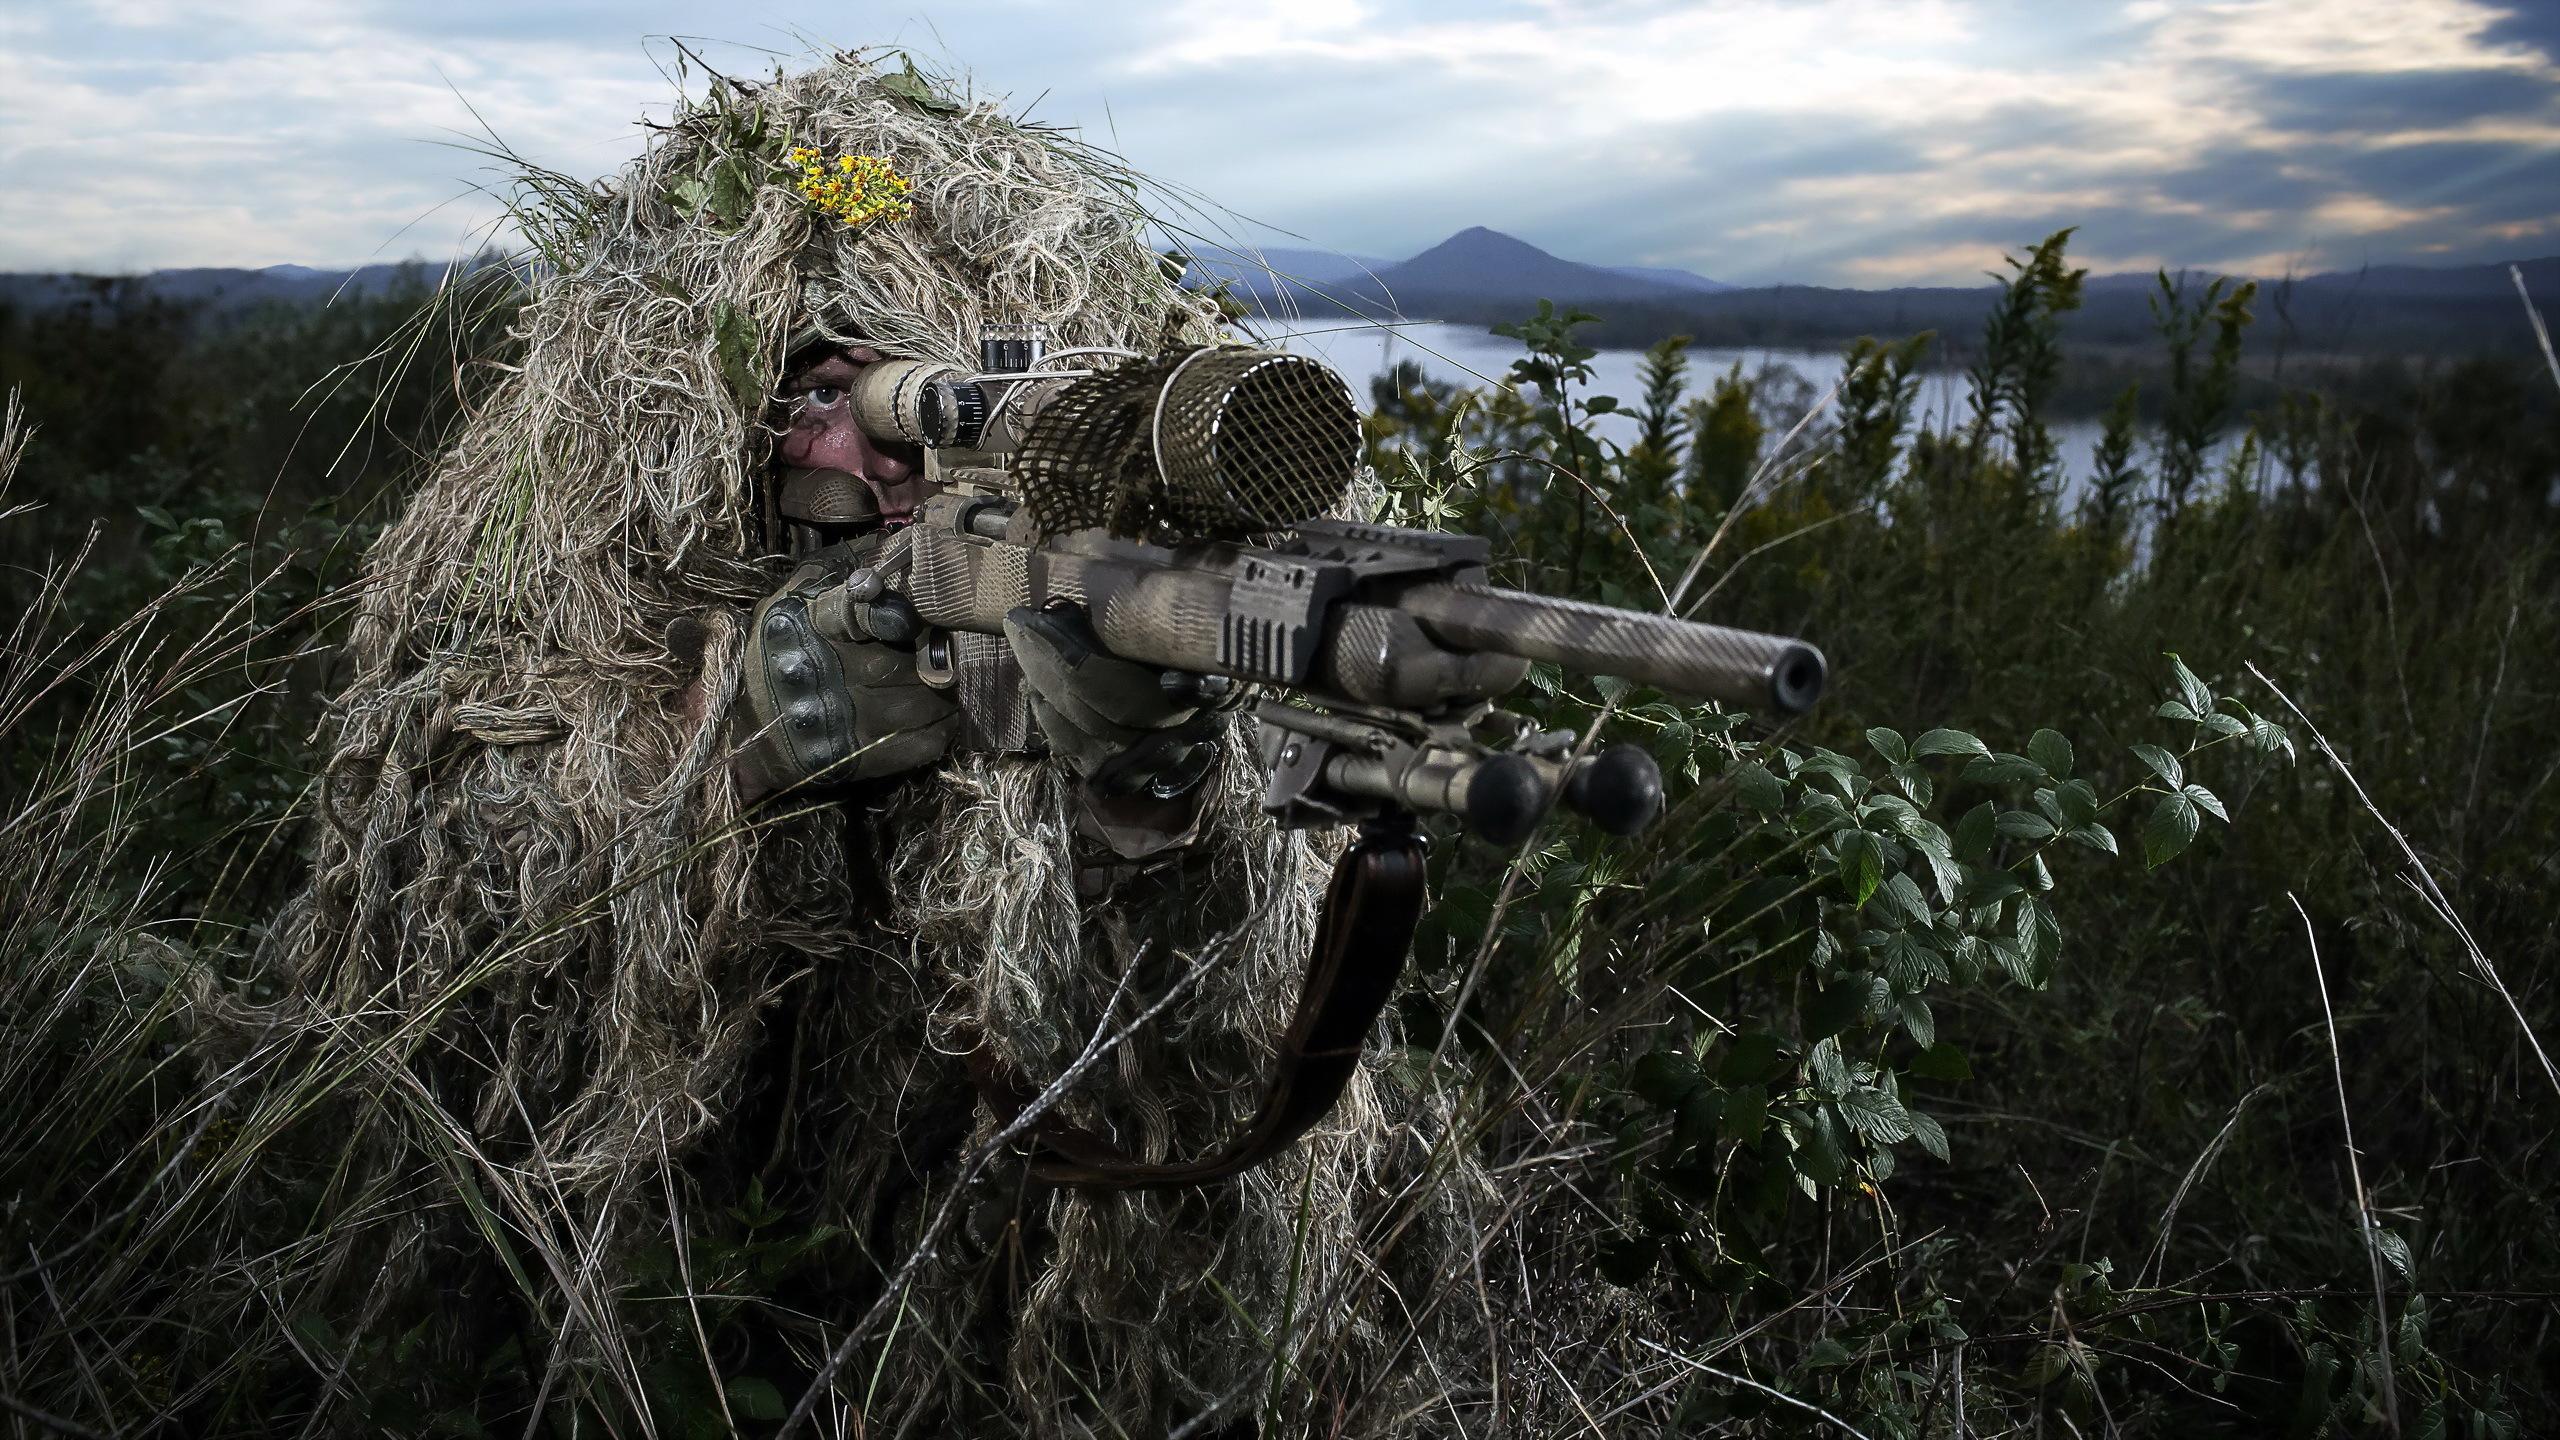 Sniper rifle soldier weapon gun military d wallpaper background 2560x1440